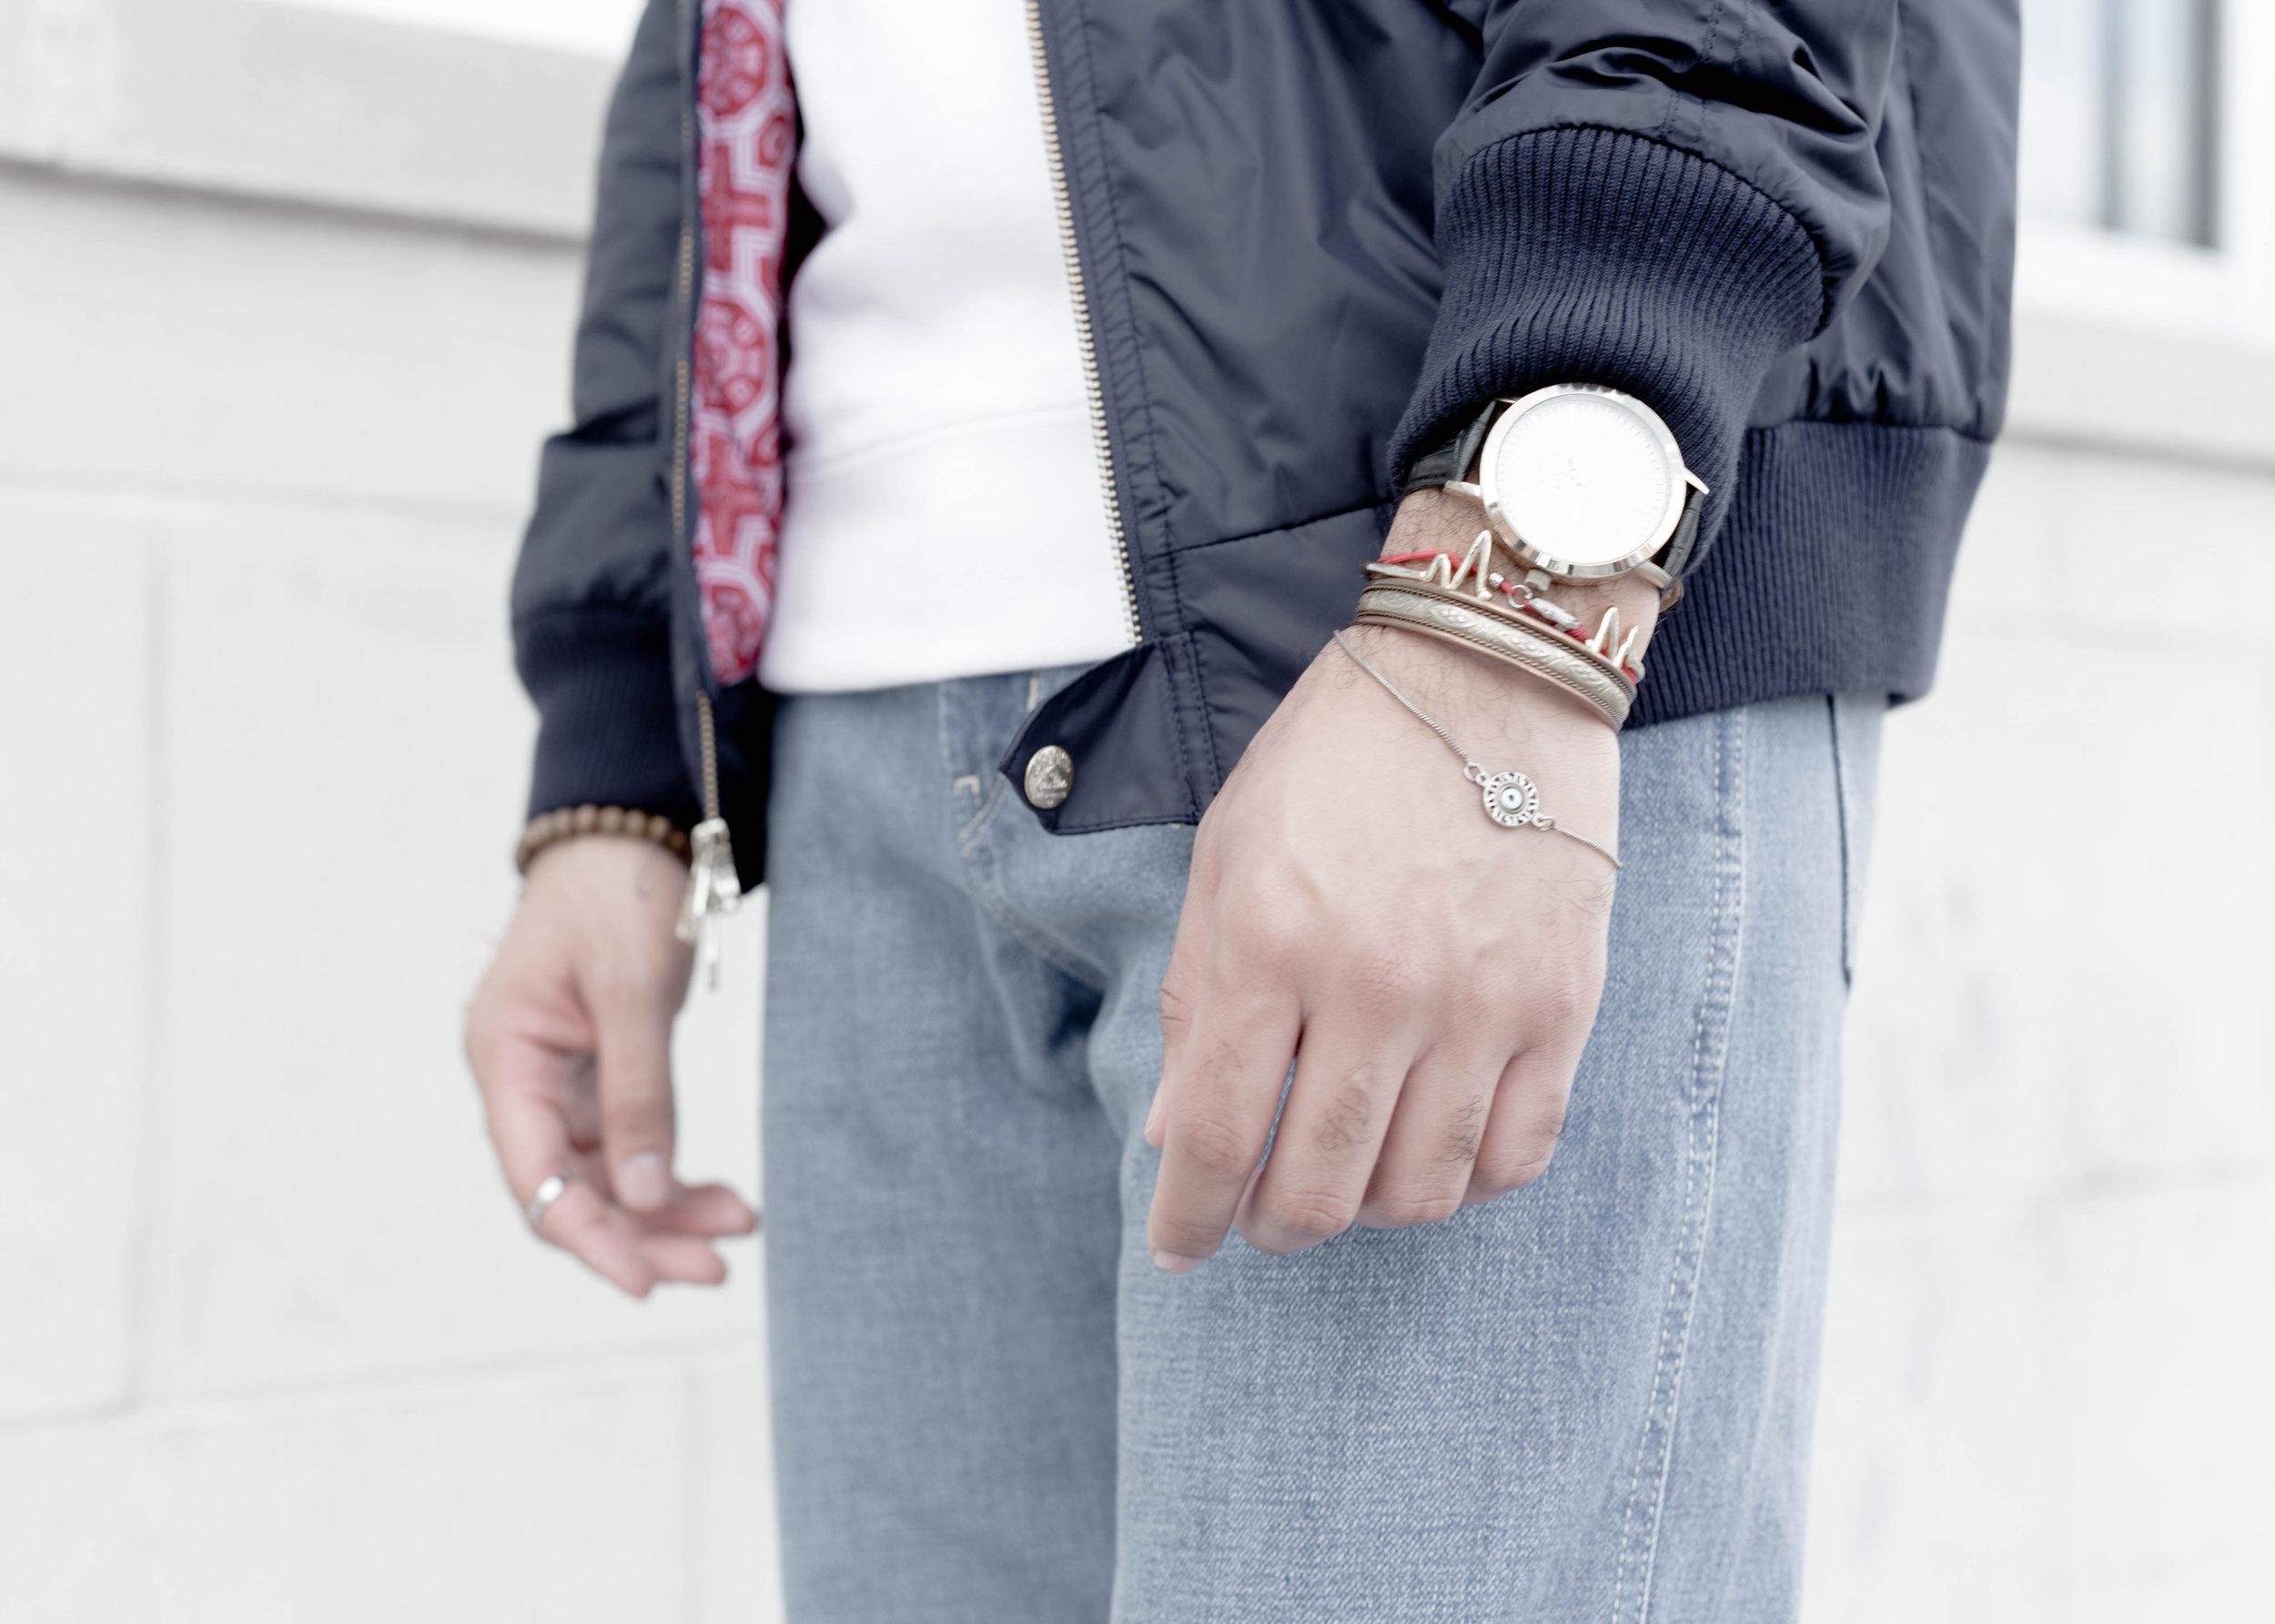 sam-c-perry-short-sleeve-sweatshirt-oversized-relaxed-denim-denim-uniqlo-u-details.jpg